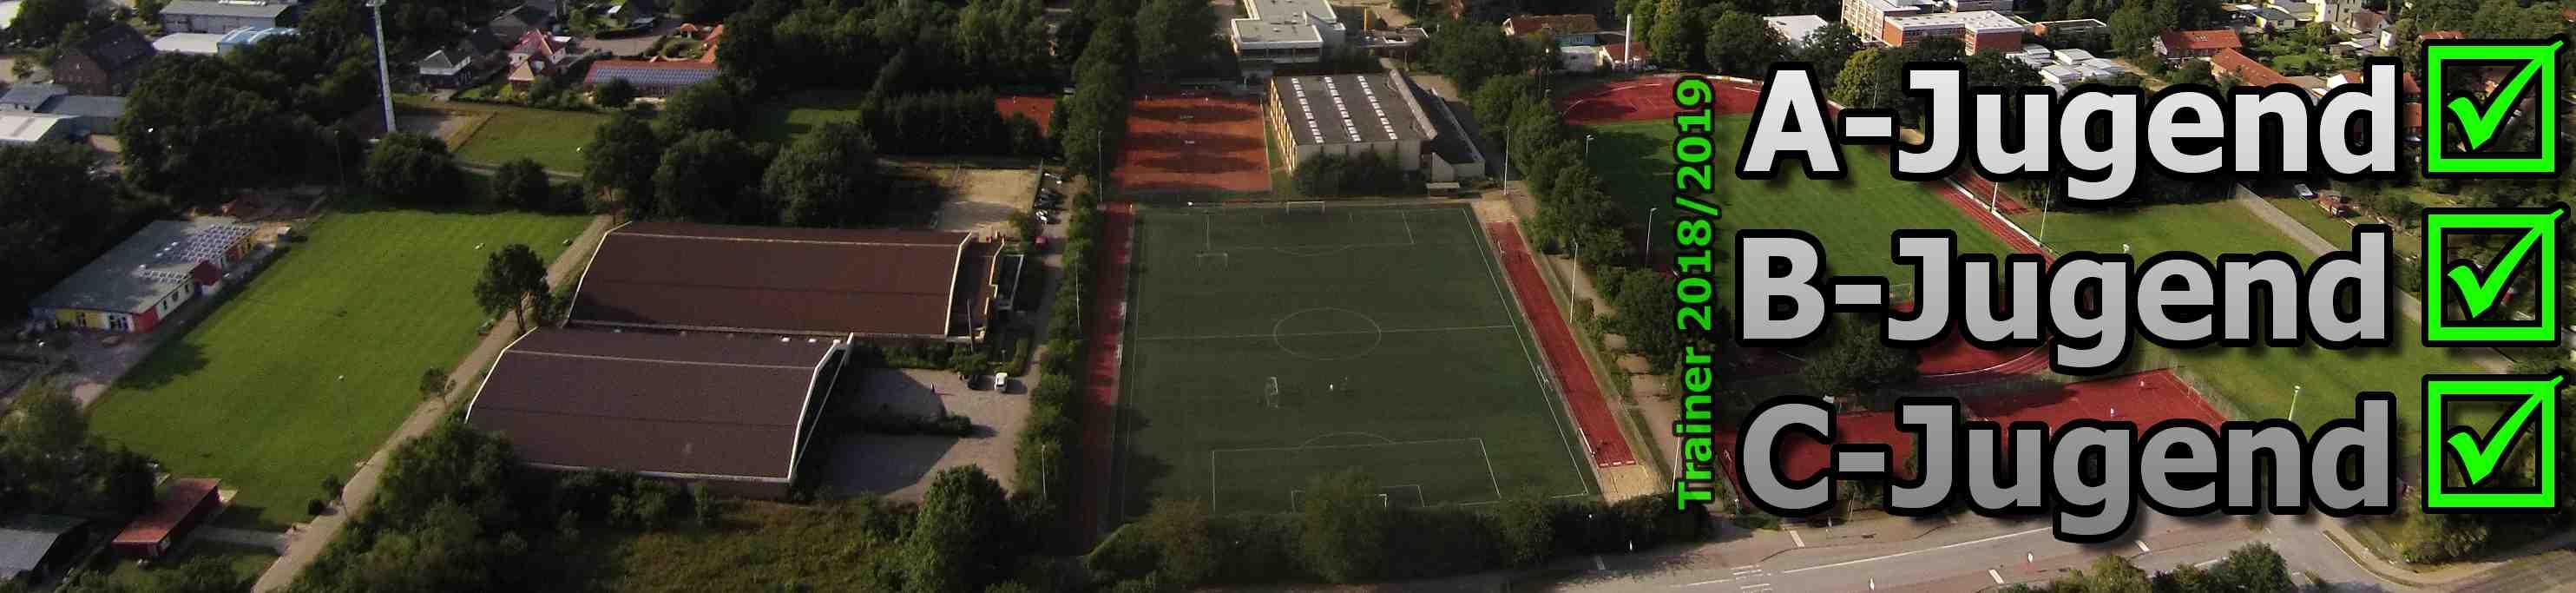 Trainerteams 2018/2019 (A/B/C-Jugend)